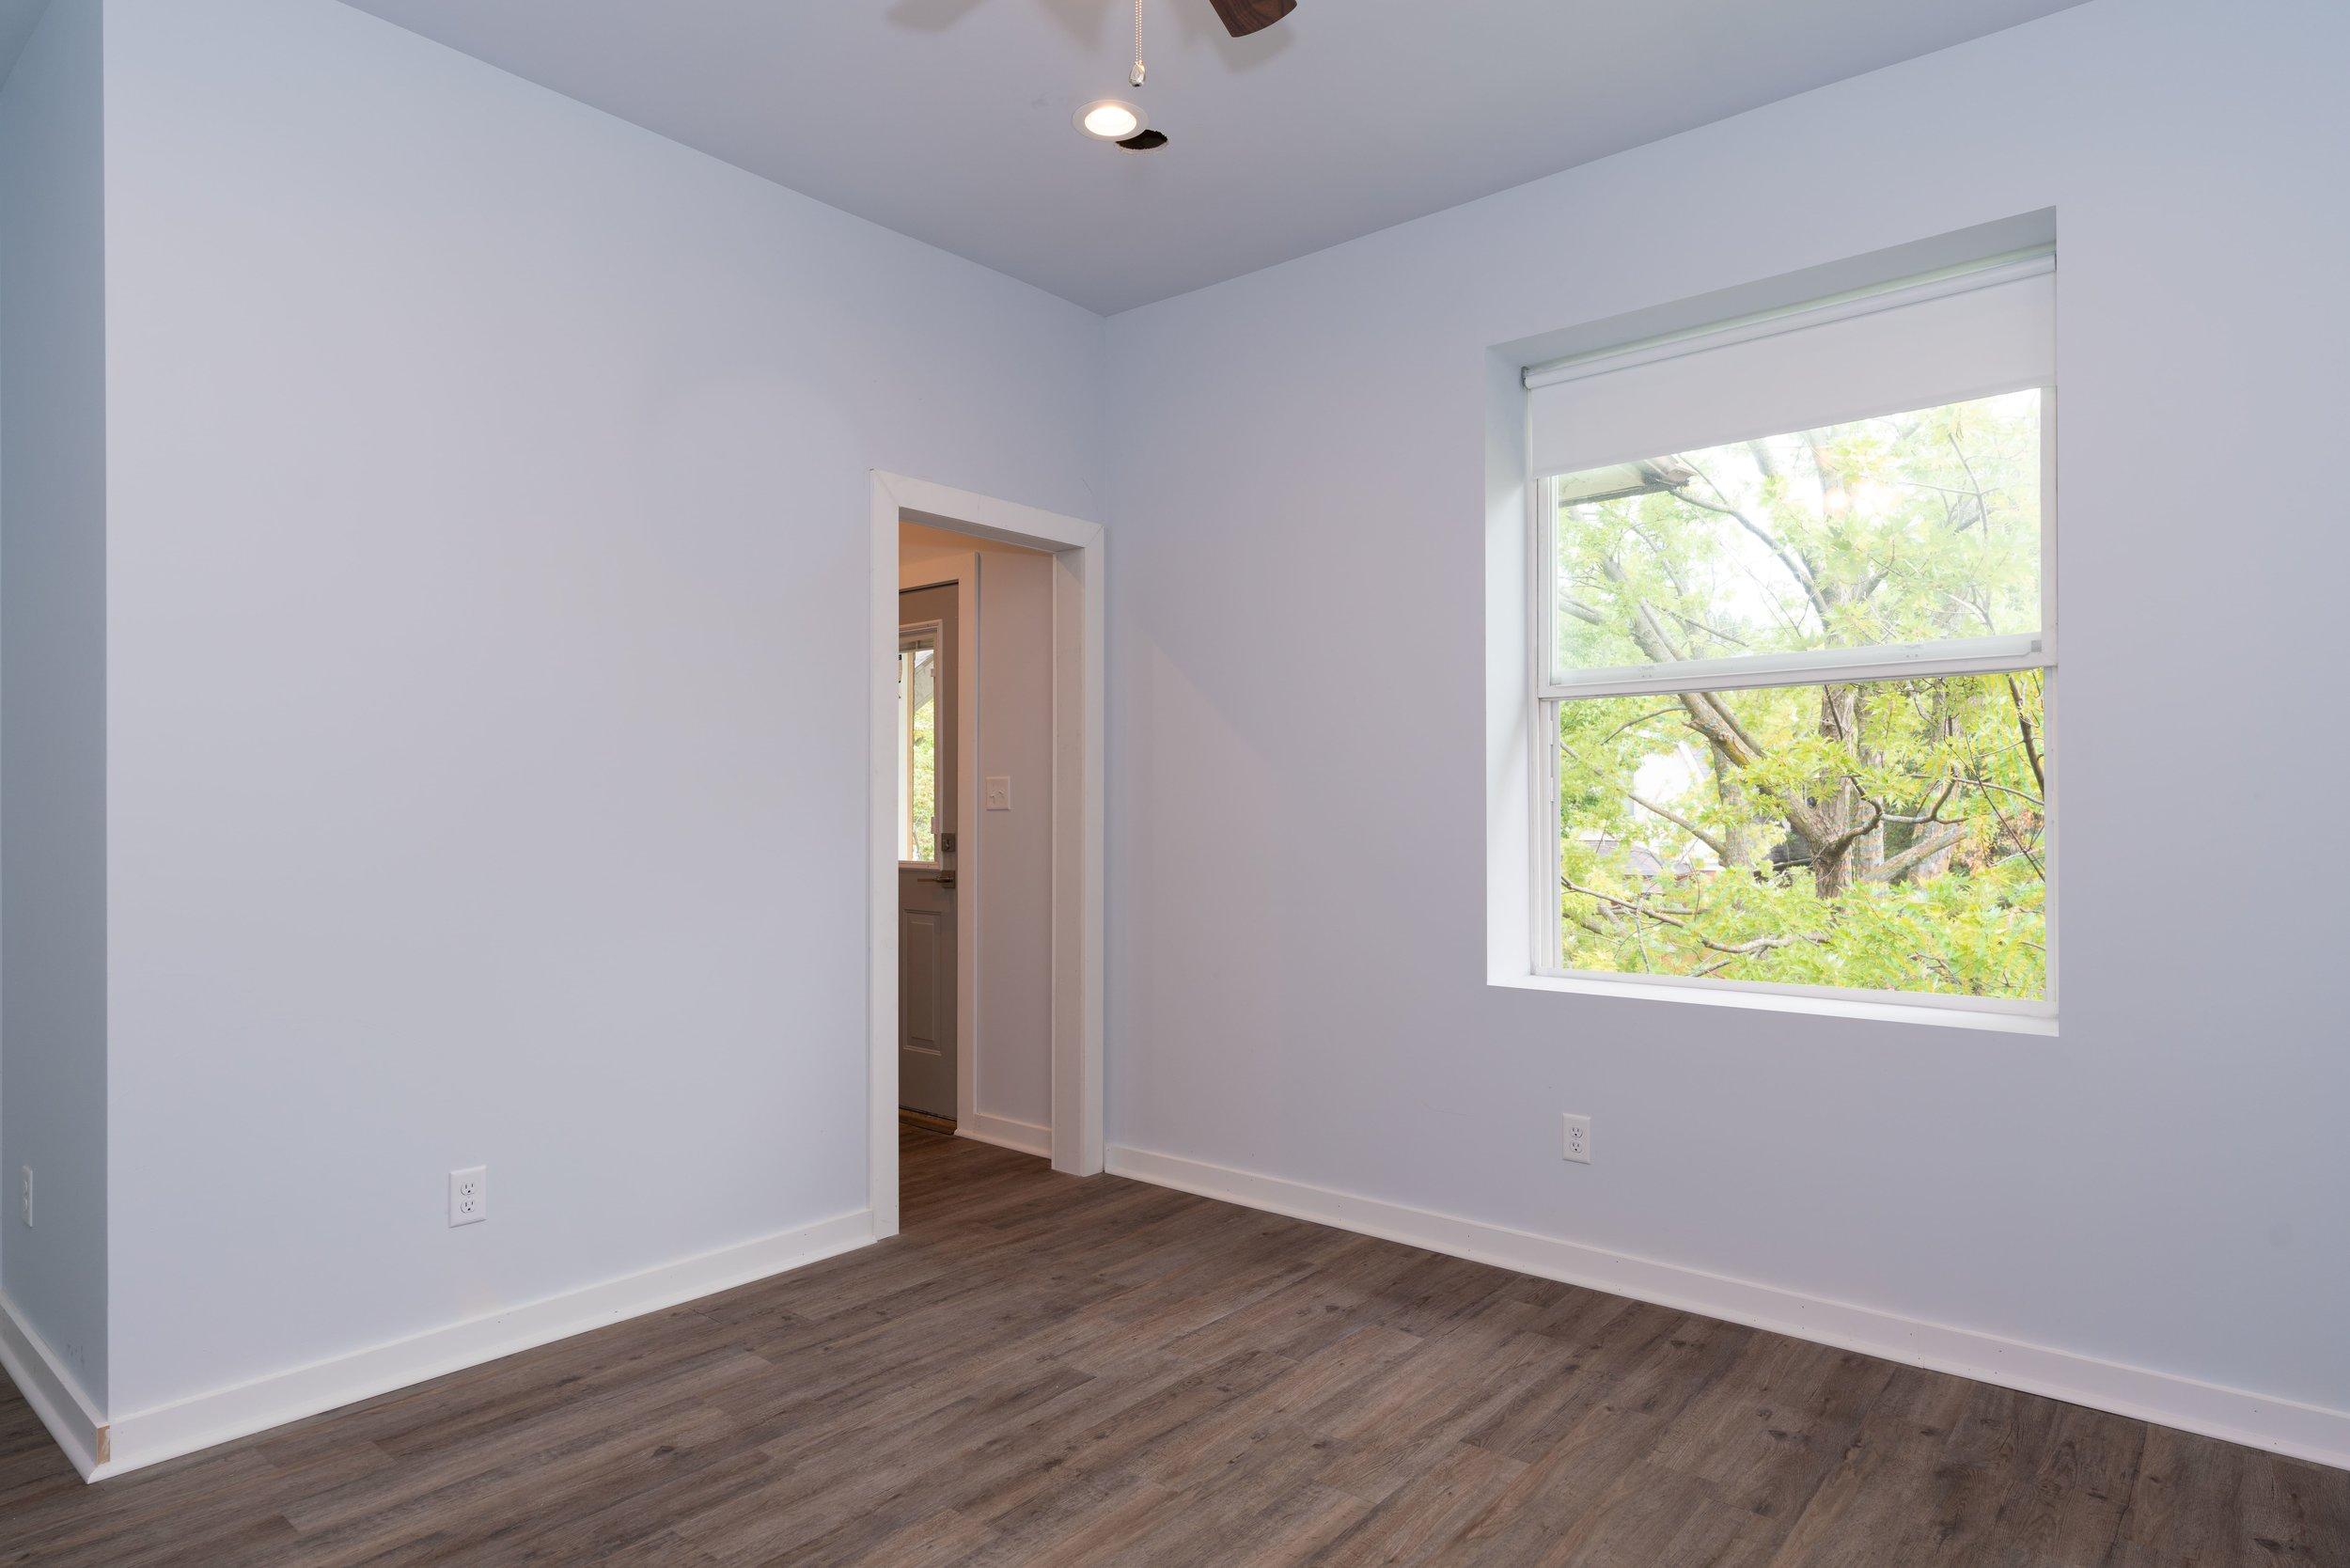 Real Estate-11-min.jpg